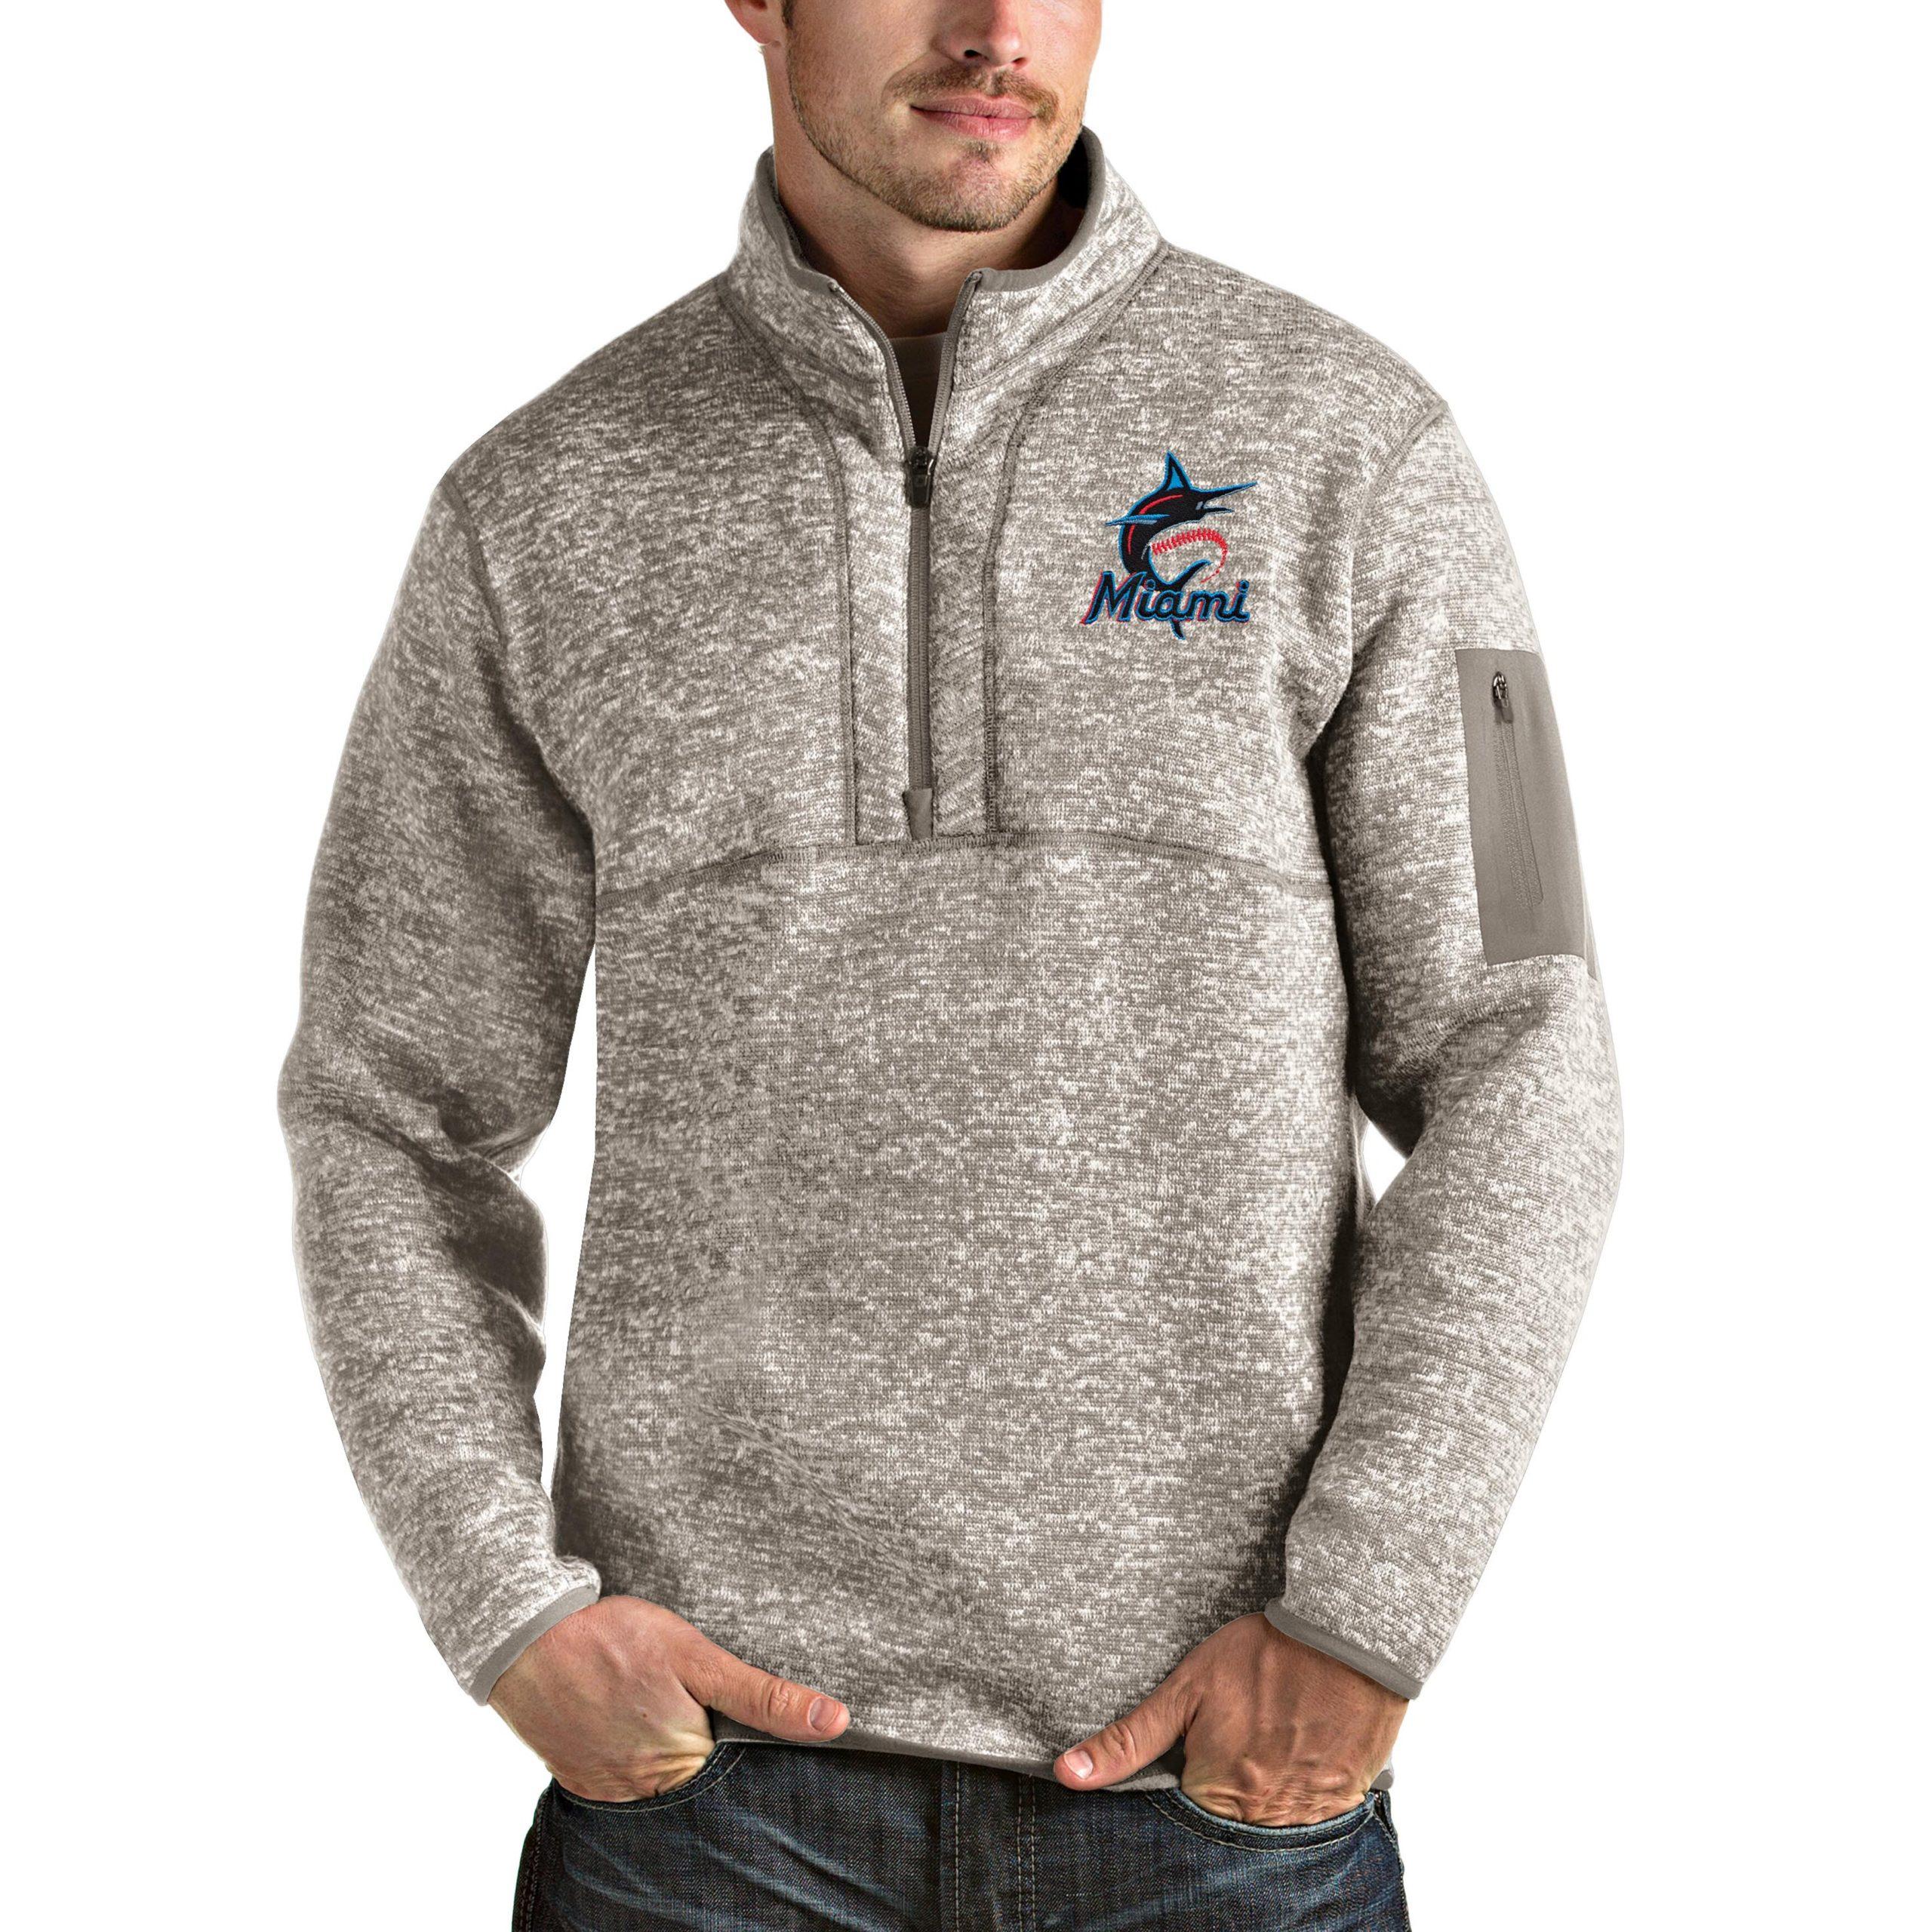 Miami Marlins Antigua Fortune Quarter-Zip Pullover Jacket - Oatmeal